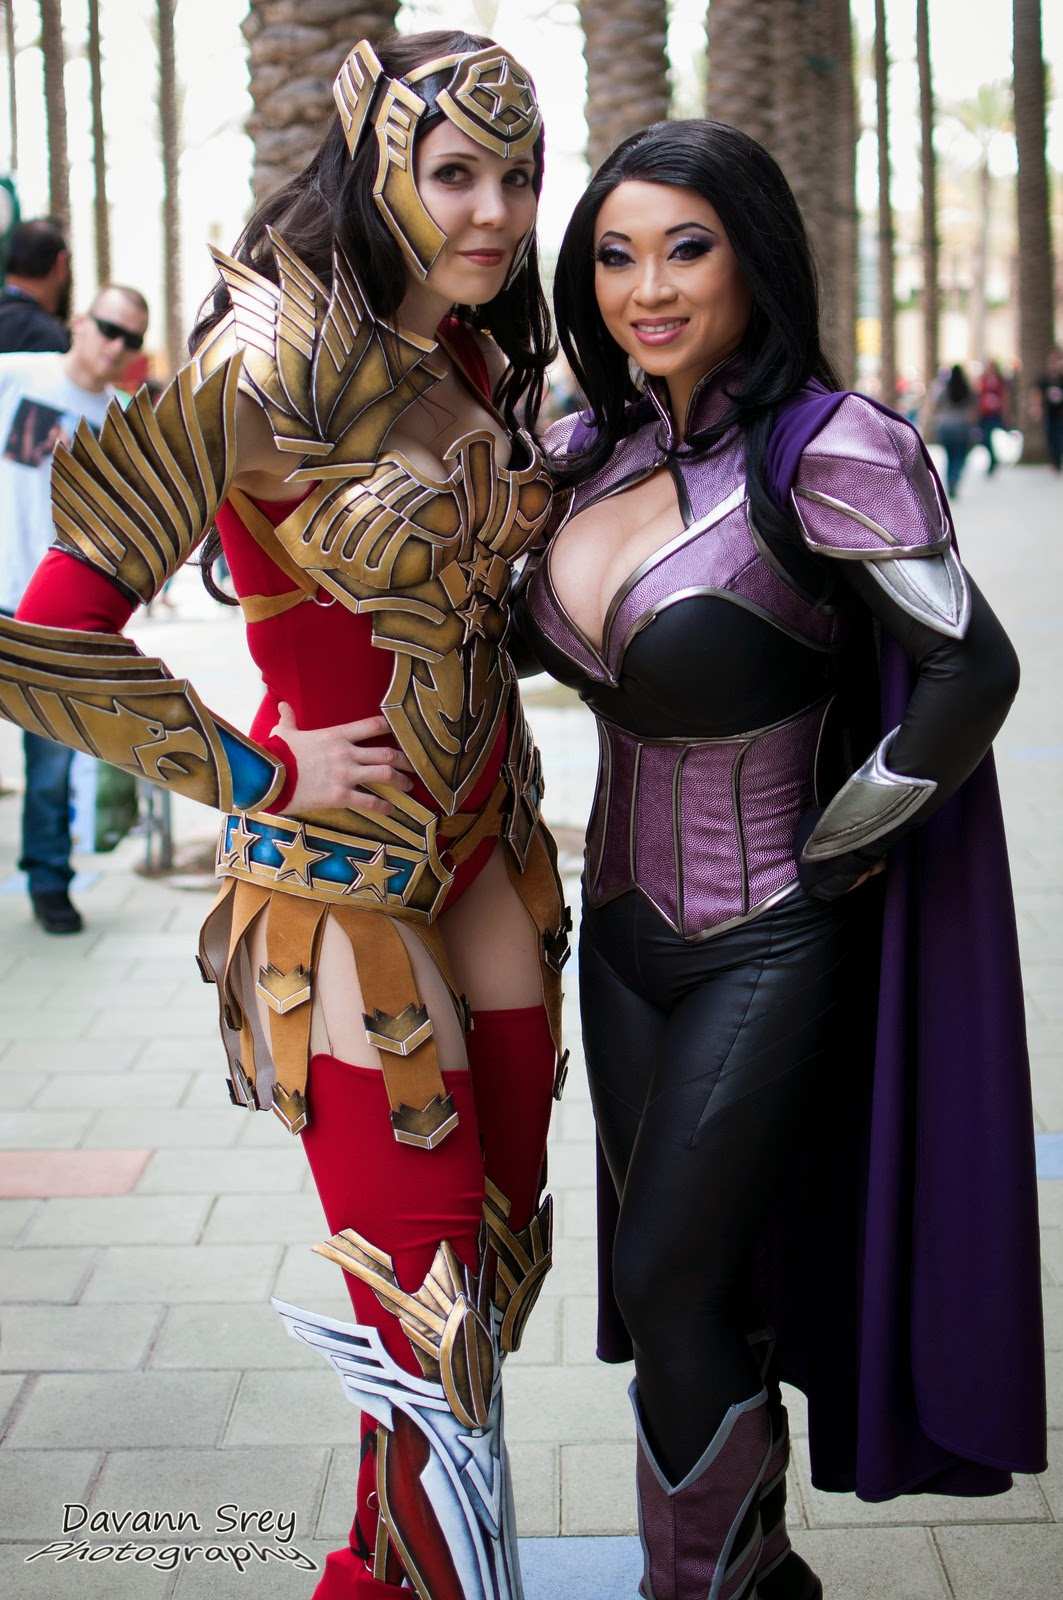 photo de cosplay de la wondercon 2014 d'une wonder woman guerrière  en duo avec yaya han en violet